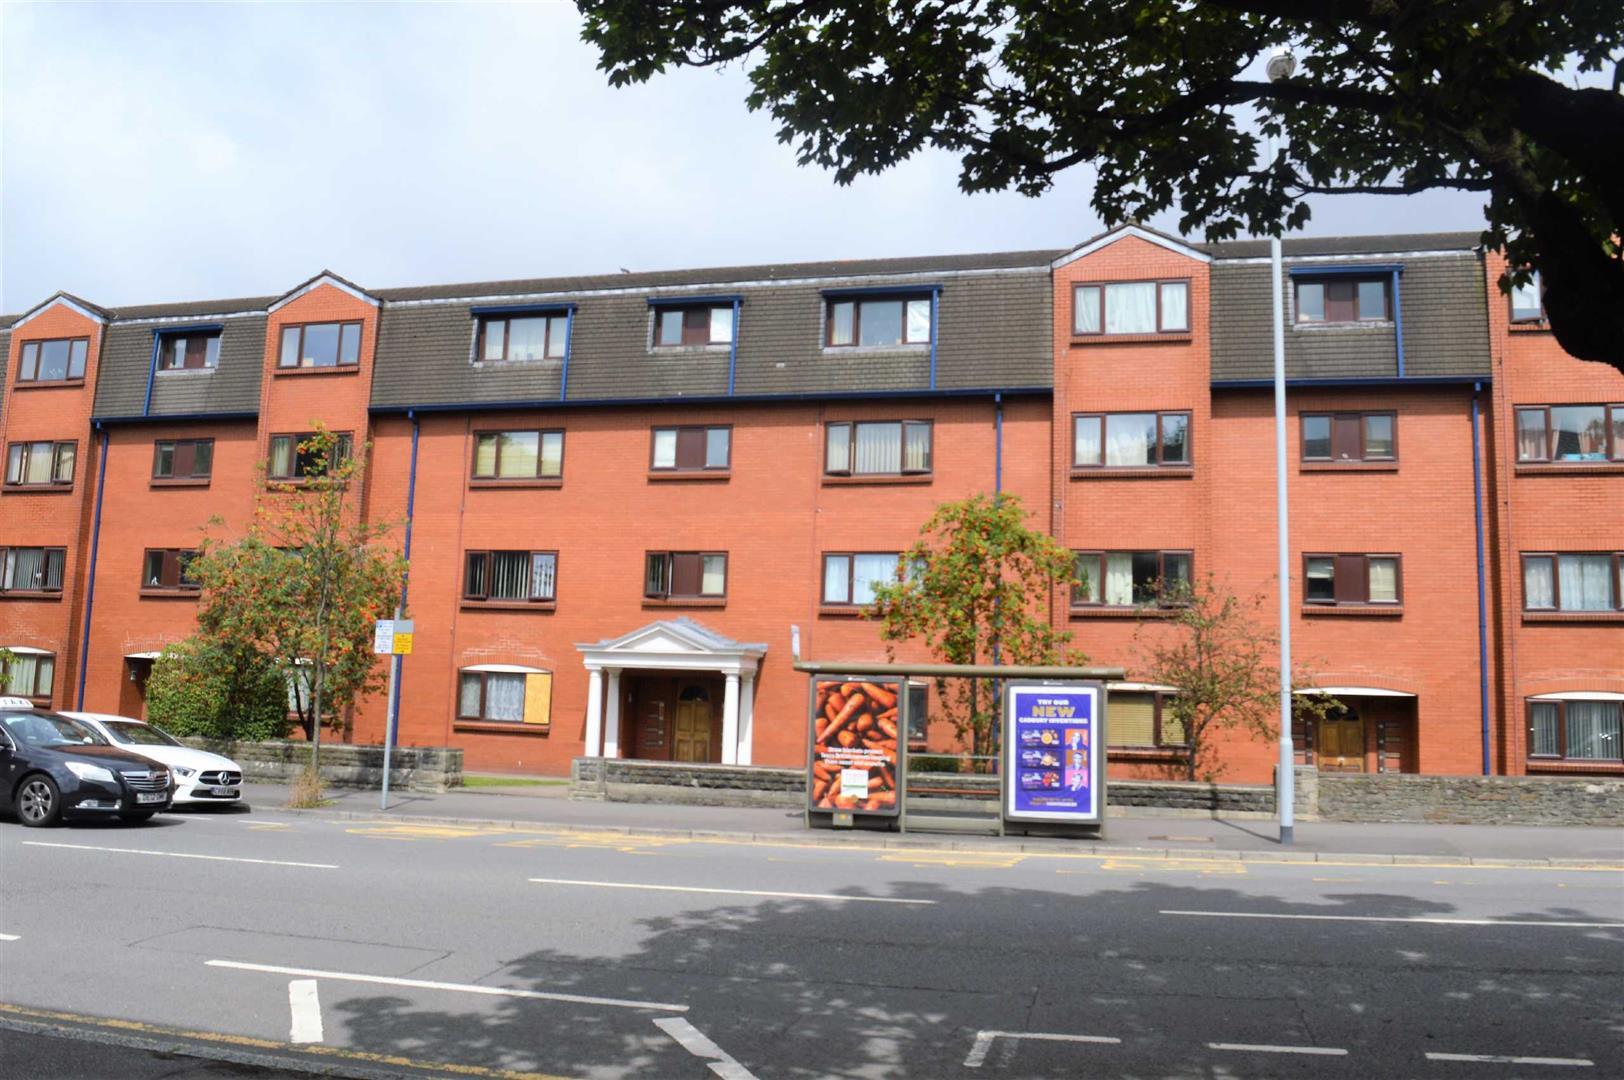 Brunel Court, Swansea, SA1 5RS